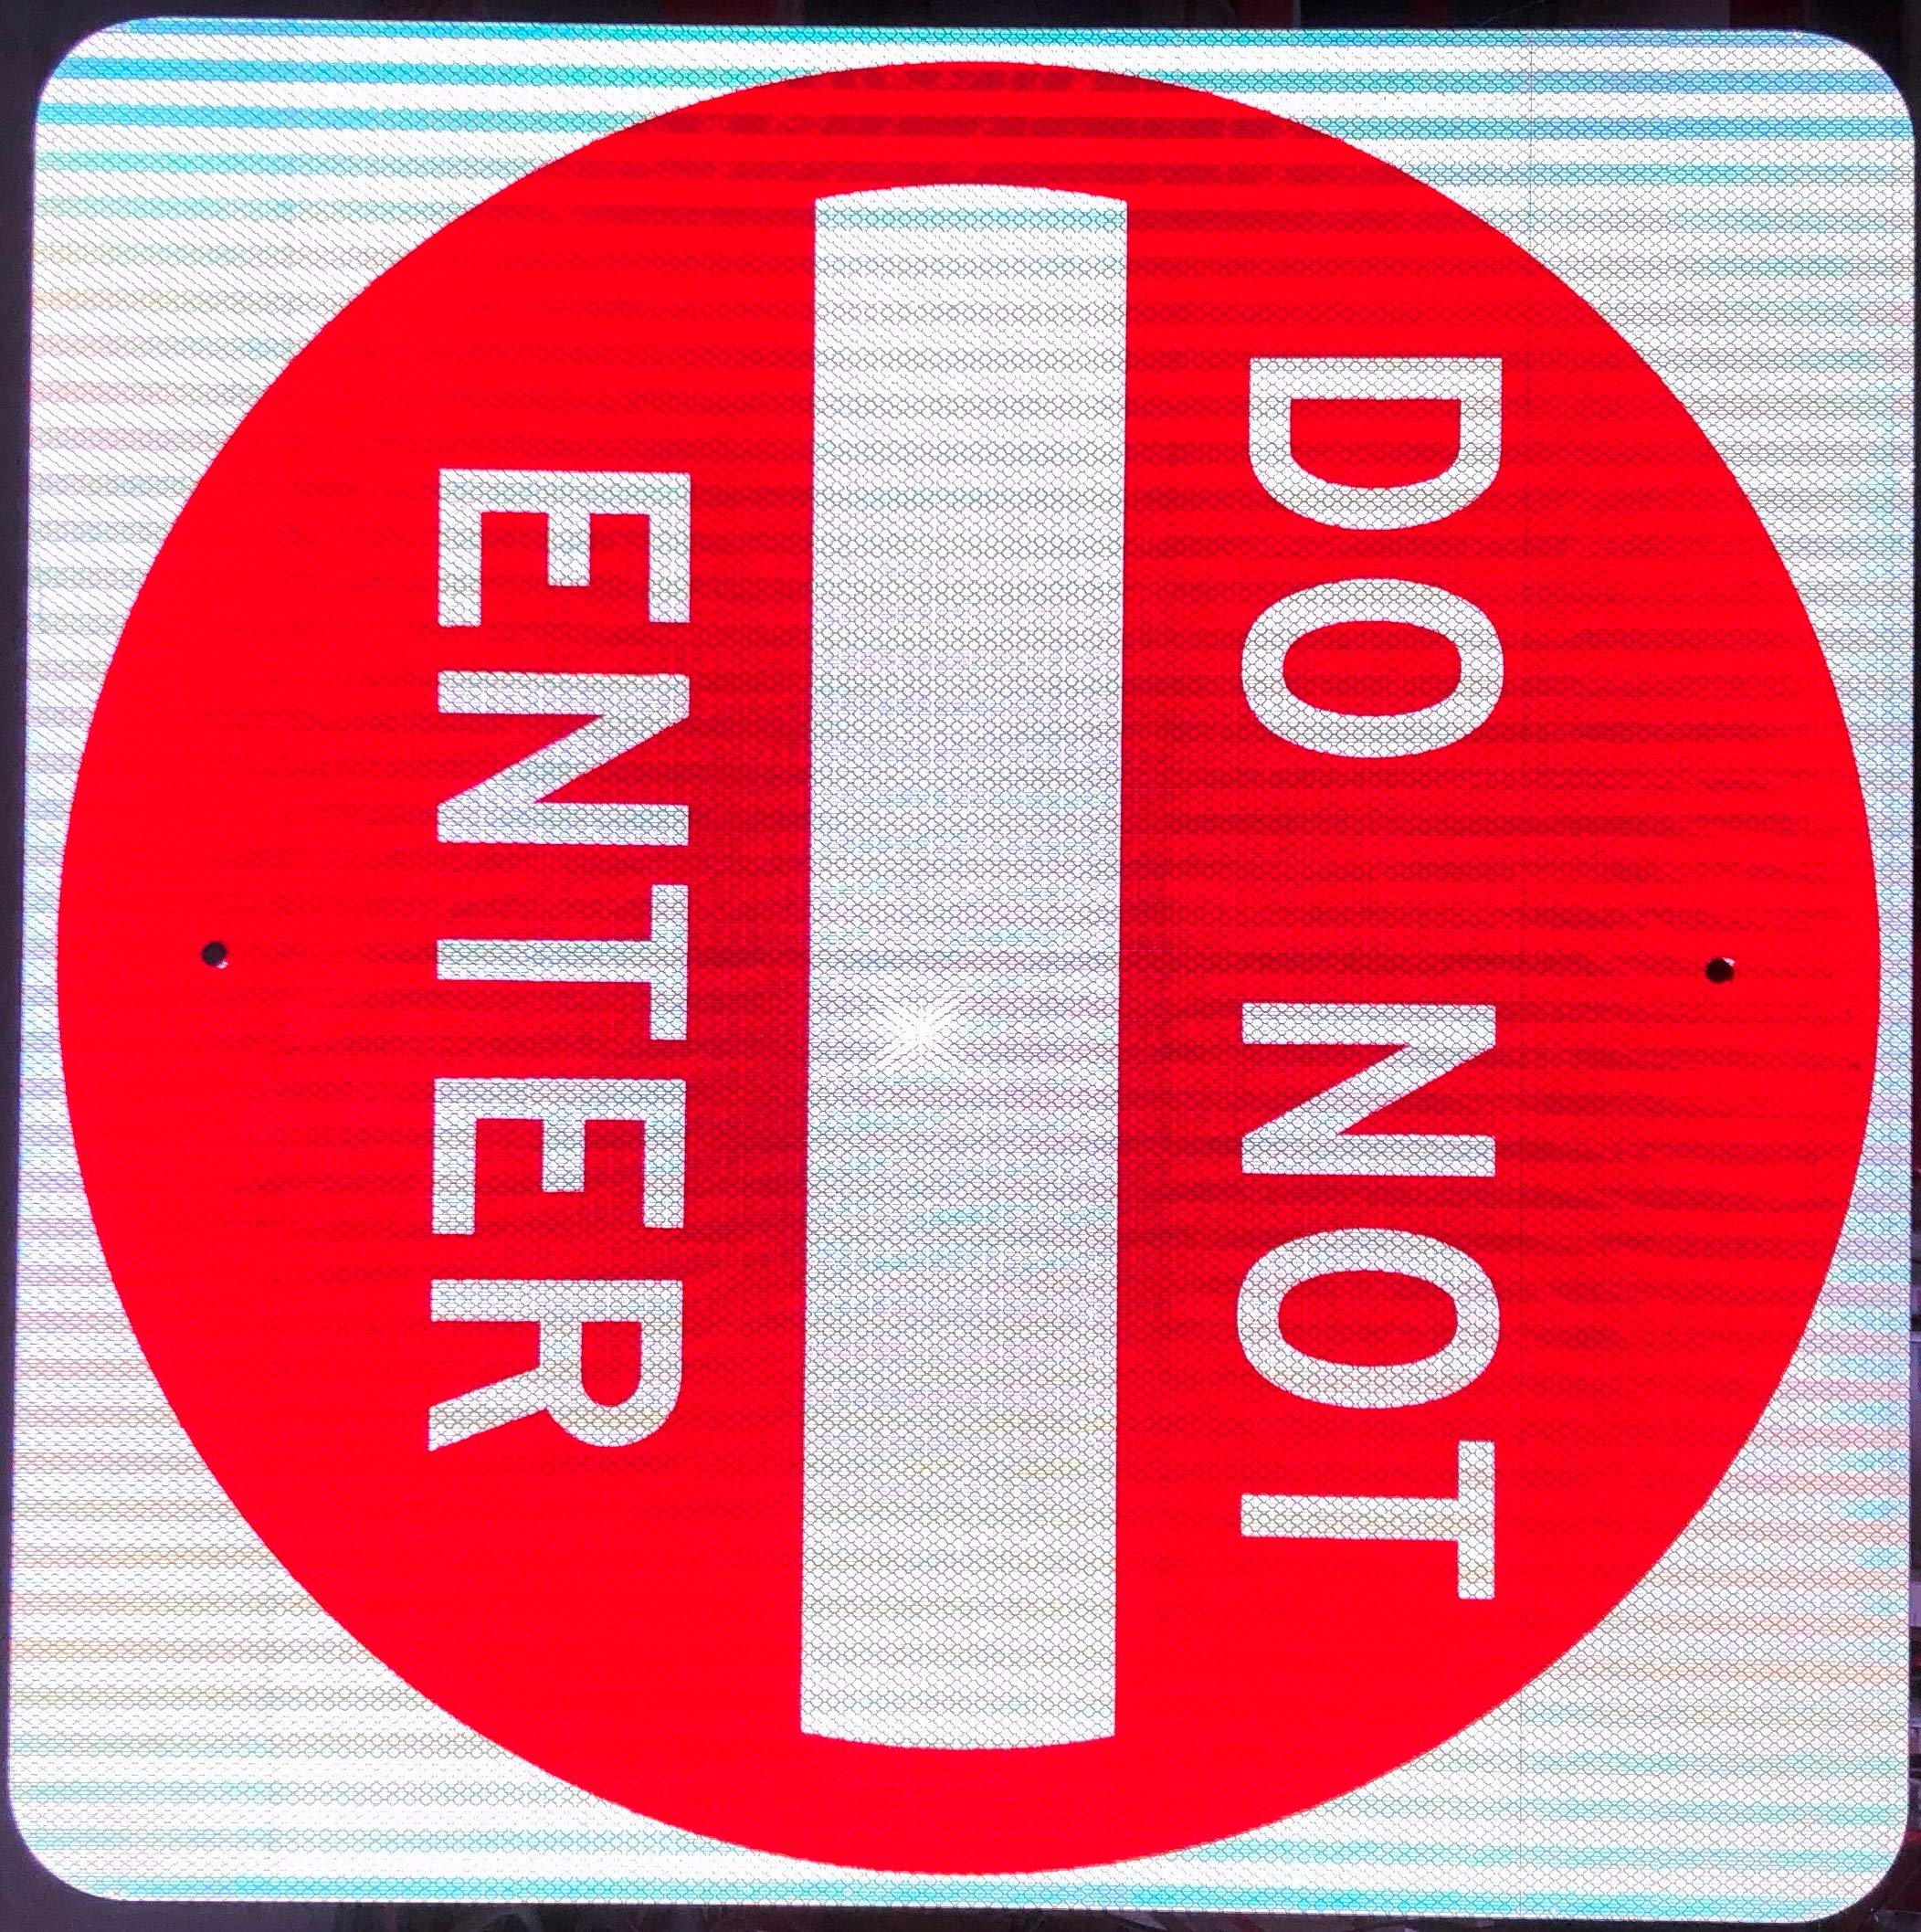 30''x30'' R5-1 Do Not Enter Sign